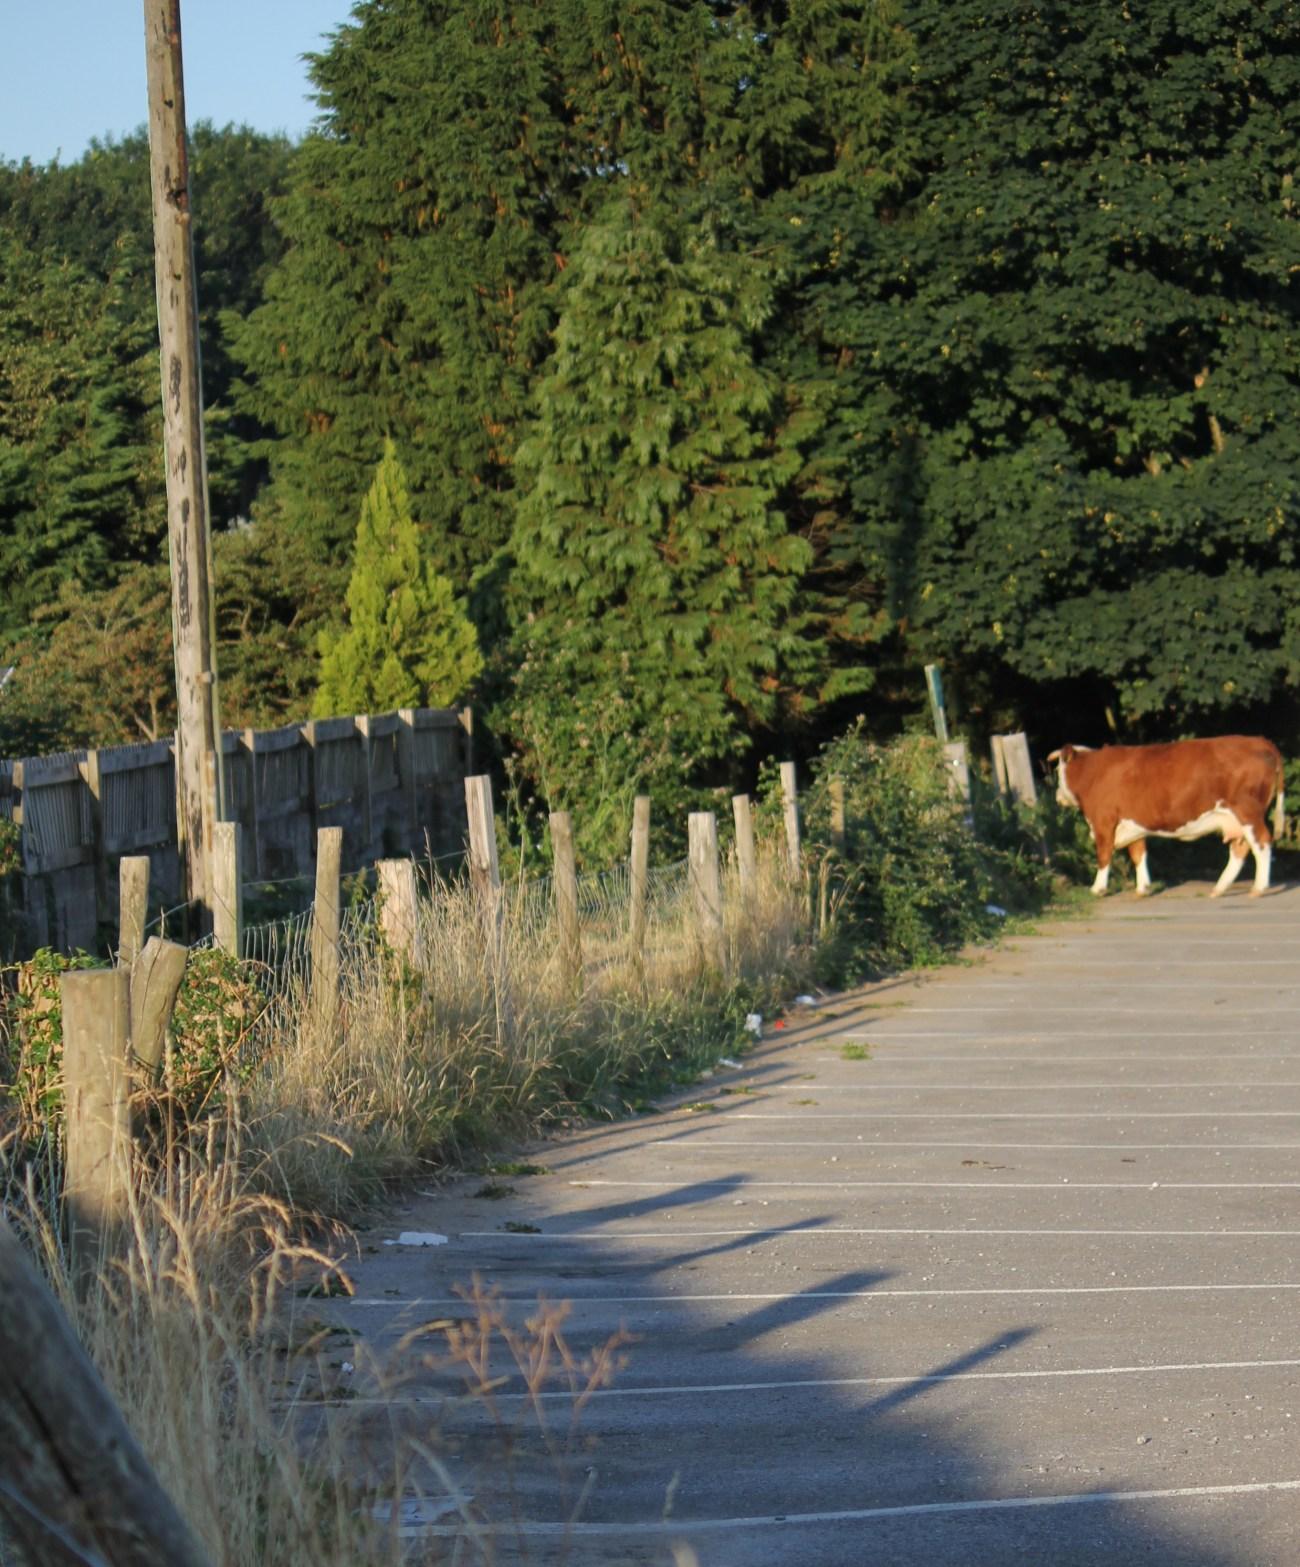 Cow in Car Park at Pennard